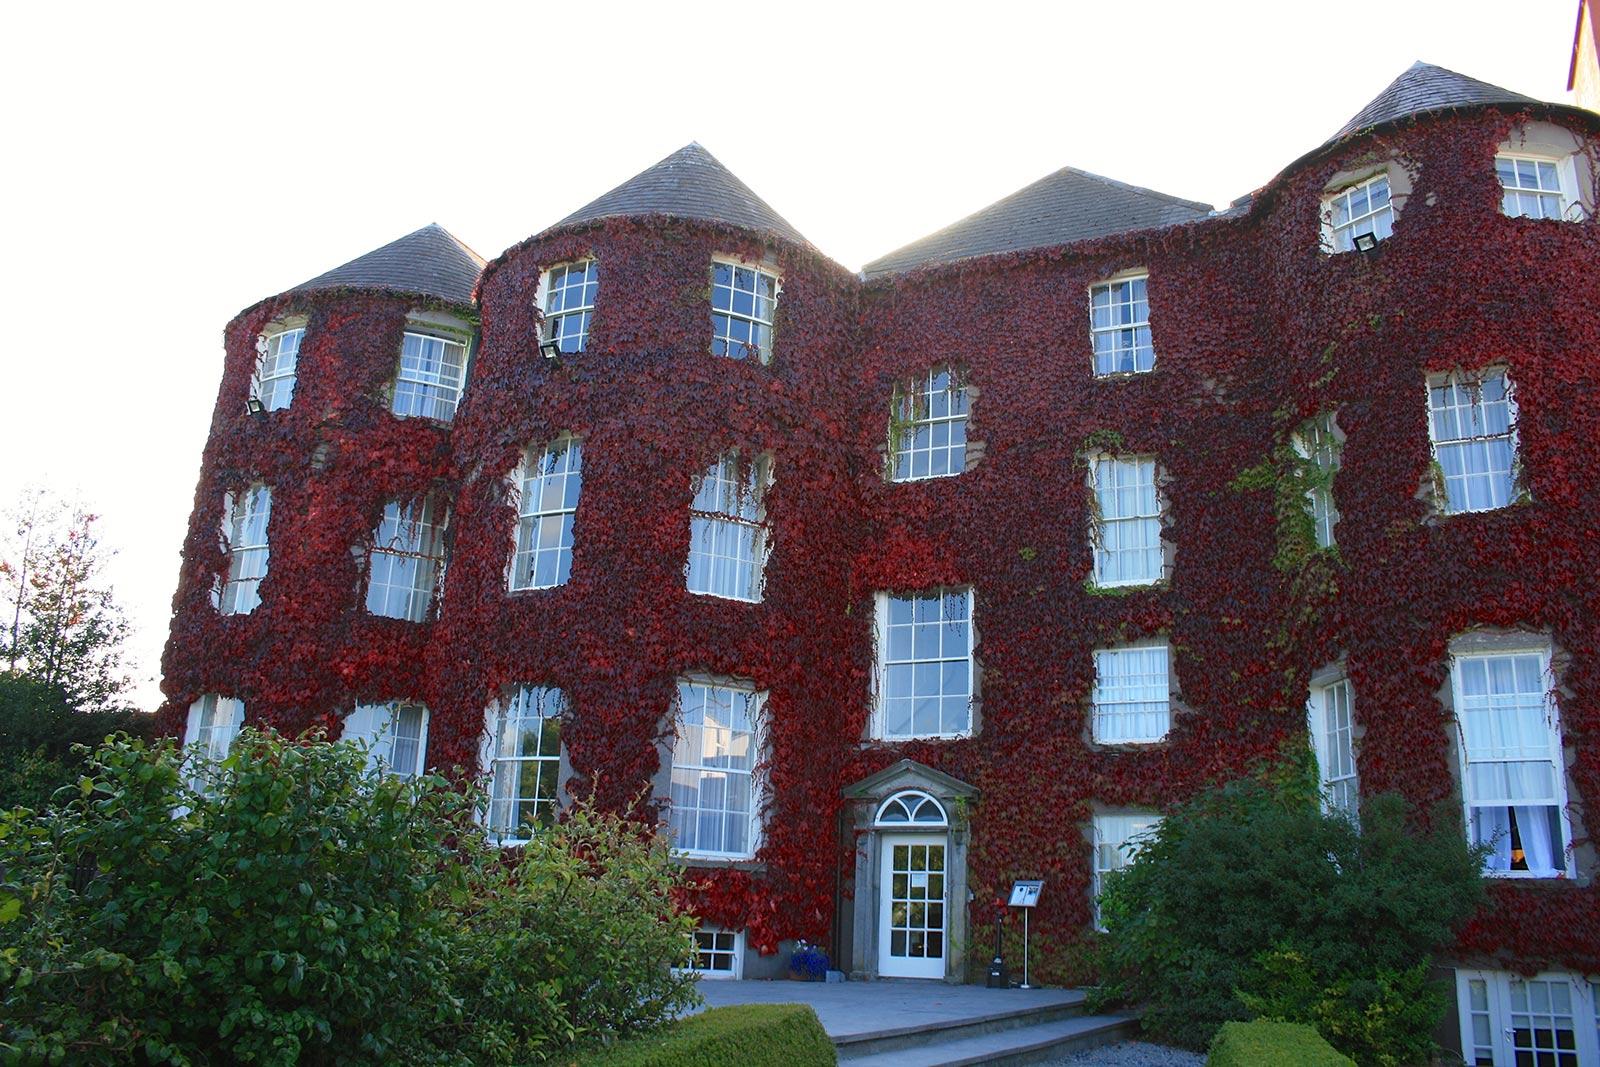 Butler House, Kilkenny, Irland; Reisetipps Irland Rundreise;